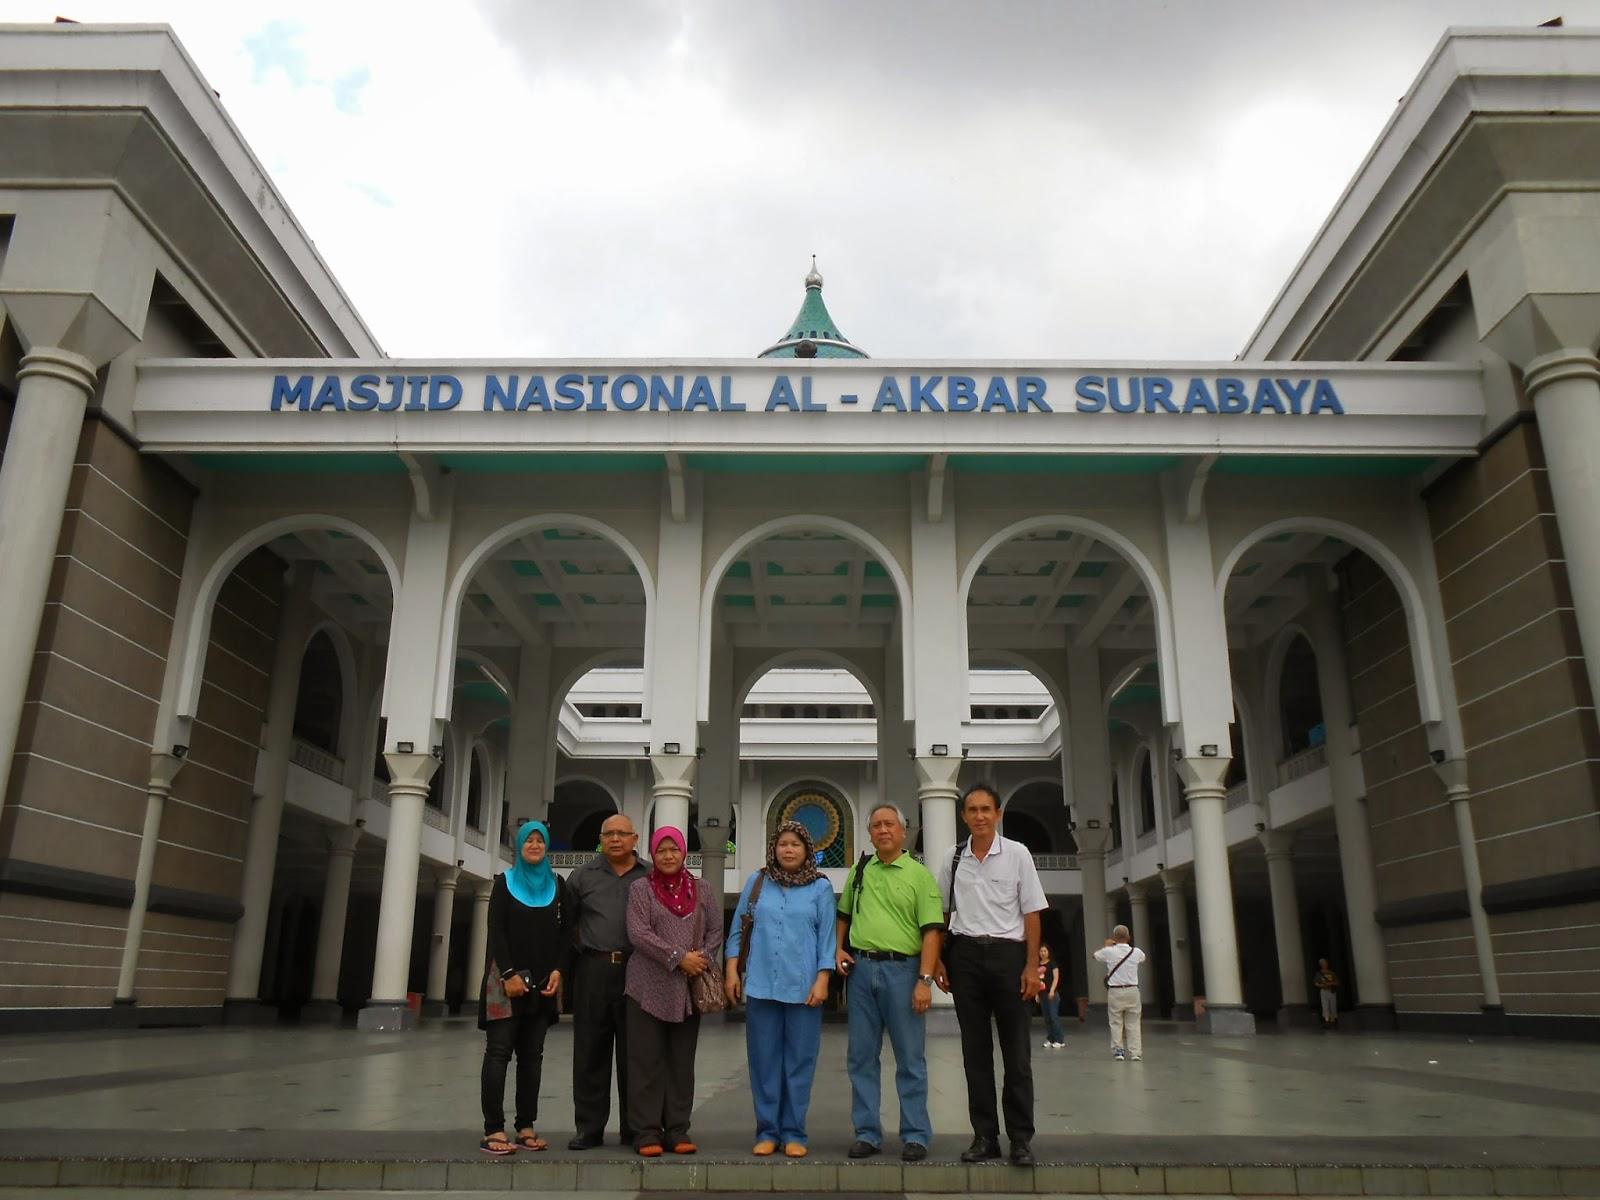 Kemegahan Masjid Akbar Surabaya dan ironi Menara 99 meter